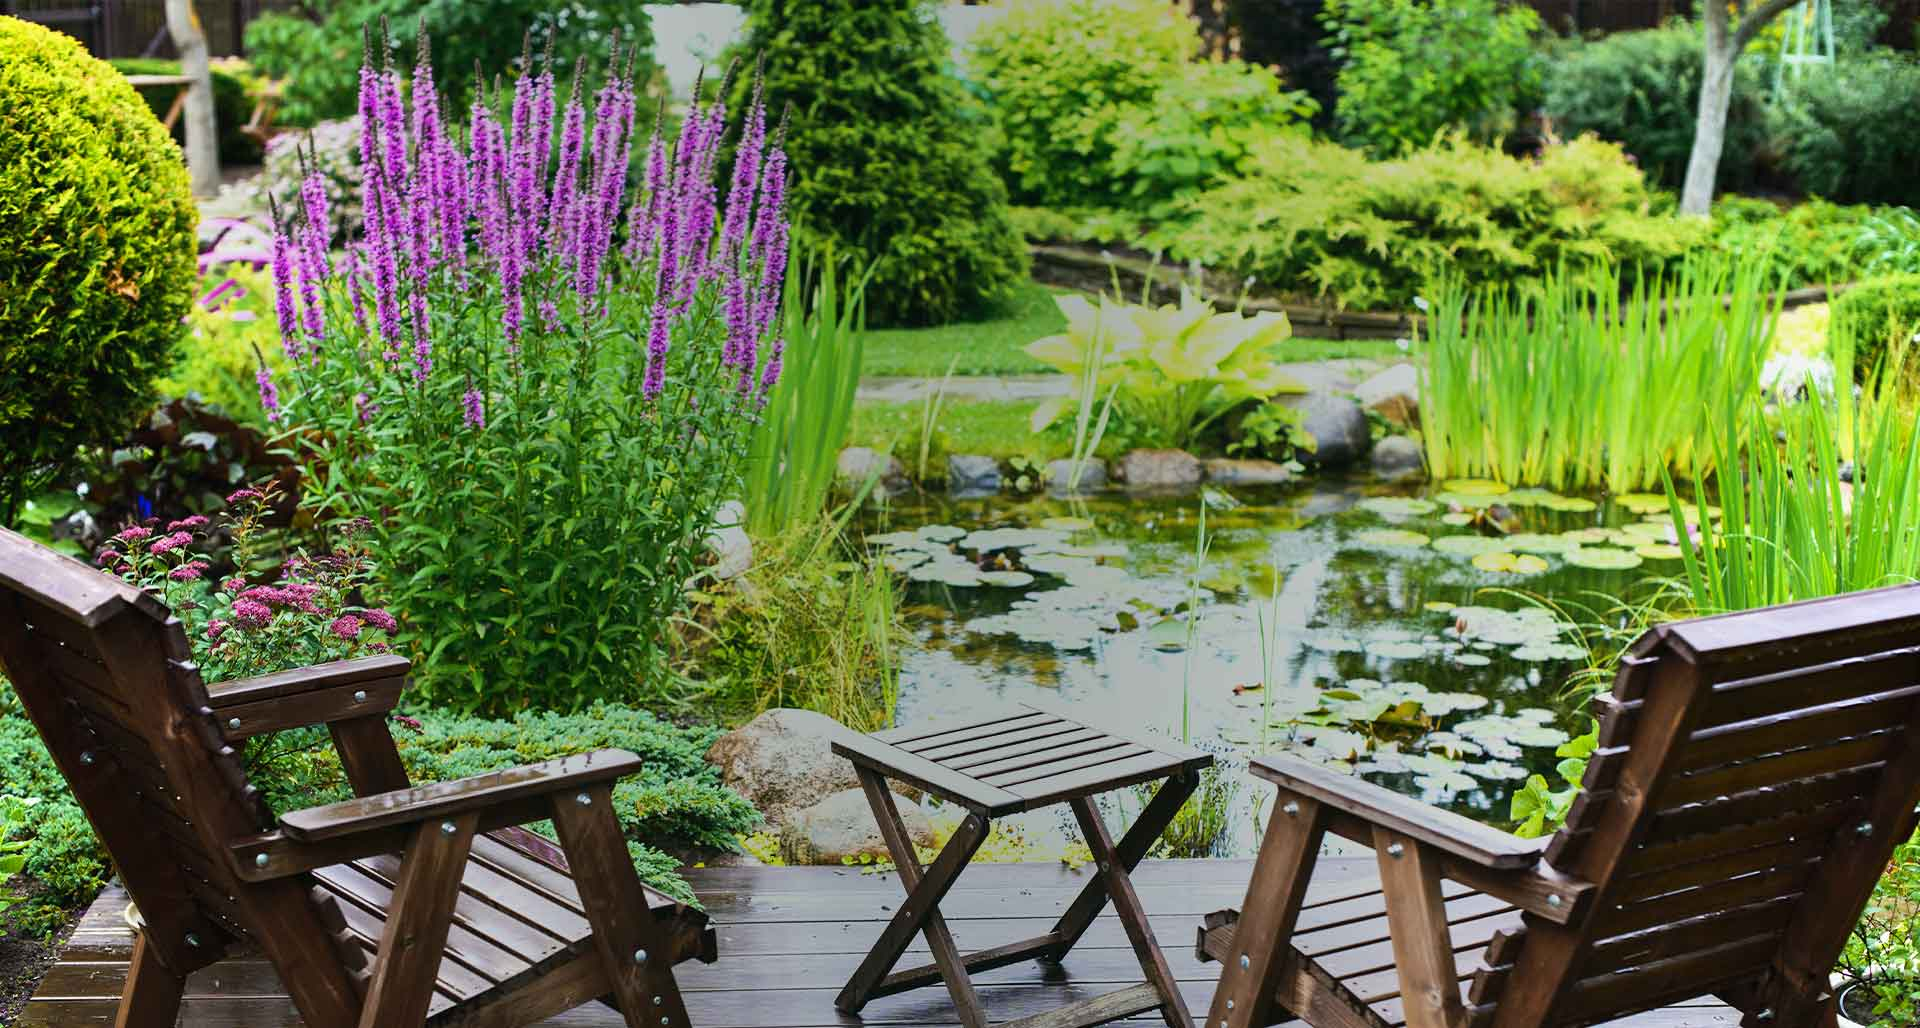 Jardineries Truffaut : Spécialiste Jardin, Animaux, Maison ... dedans Gamm Vert Salon De Jardin